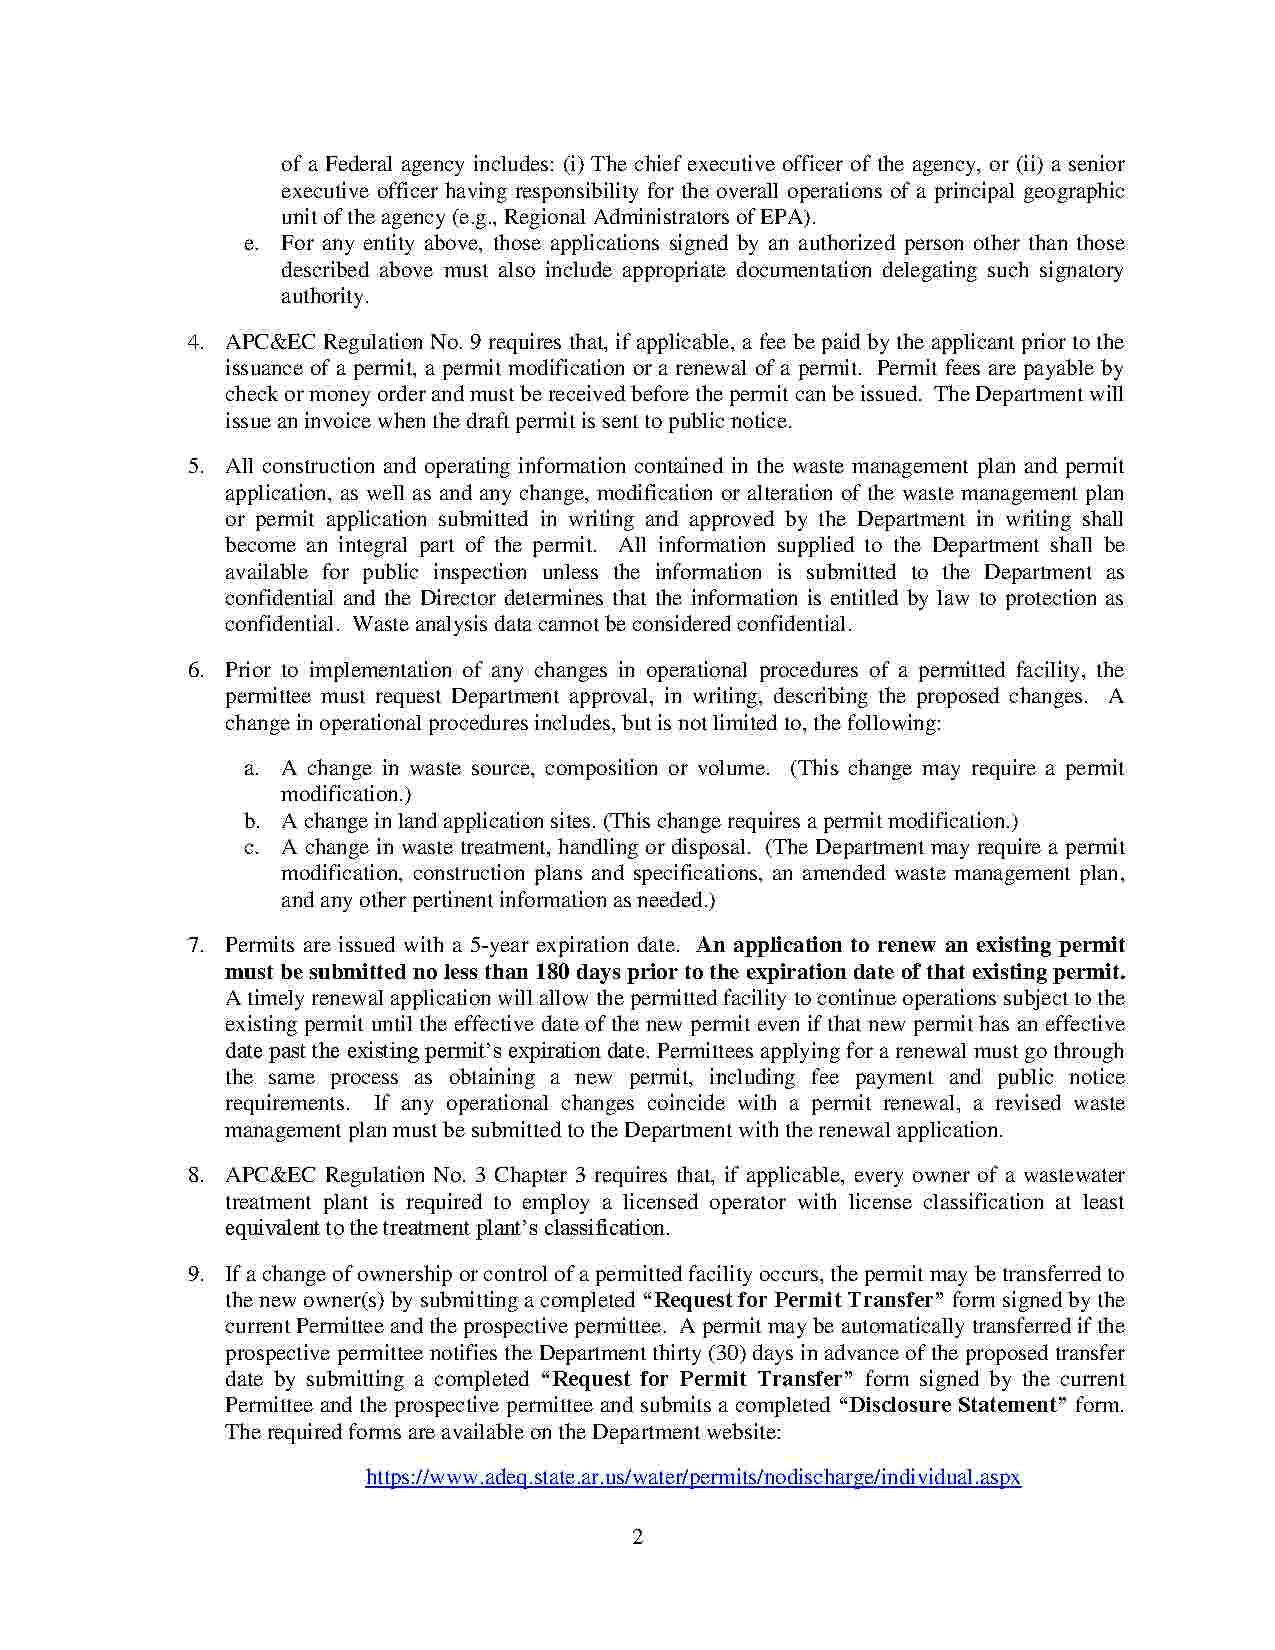 Templates Limited Liability Company (LLC) Operating